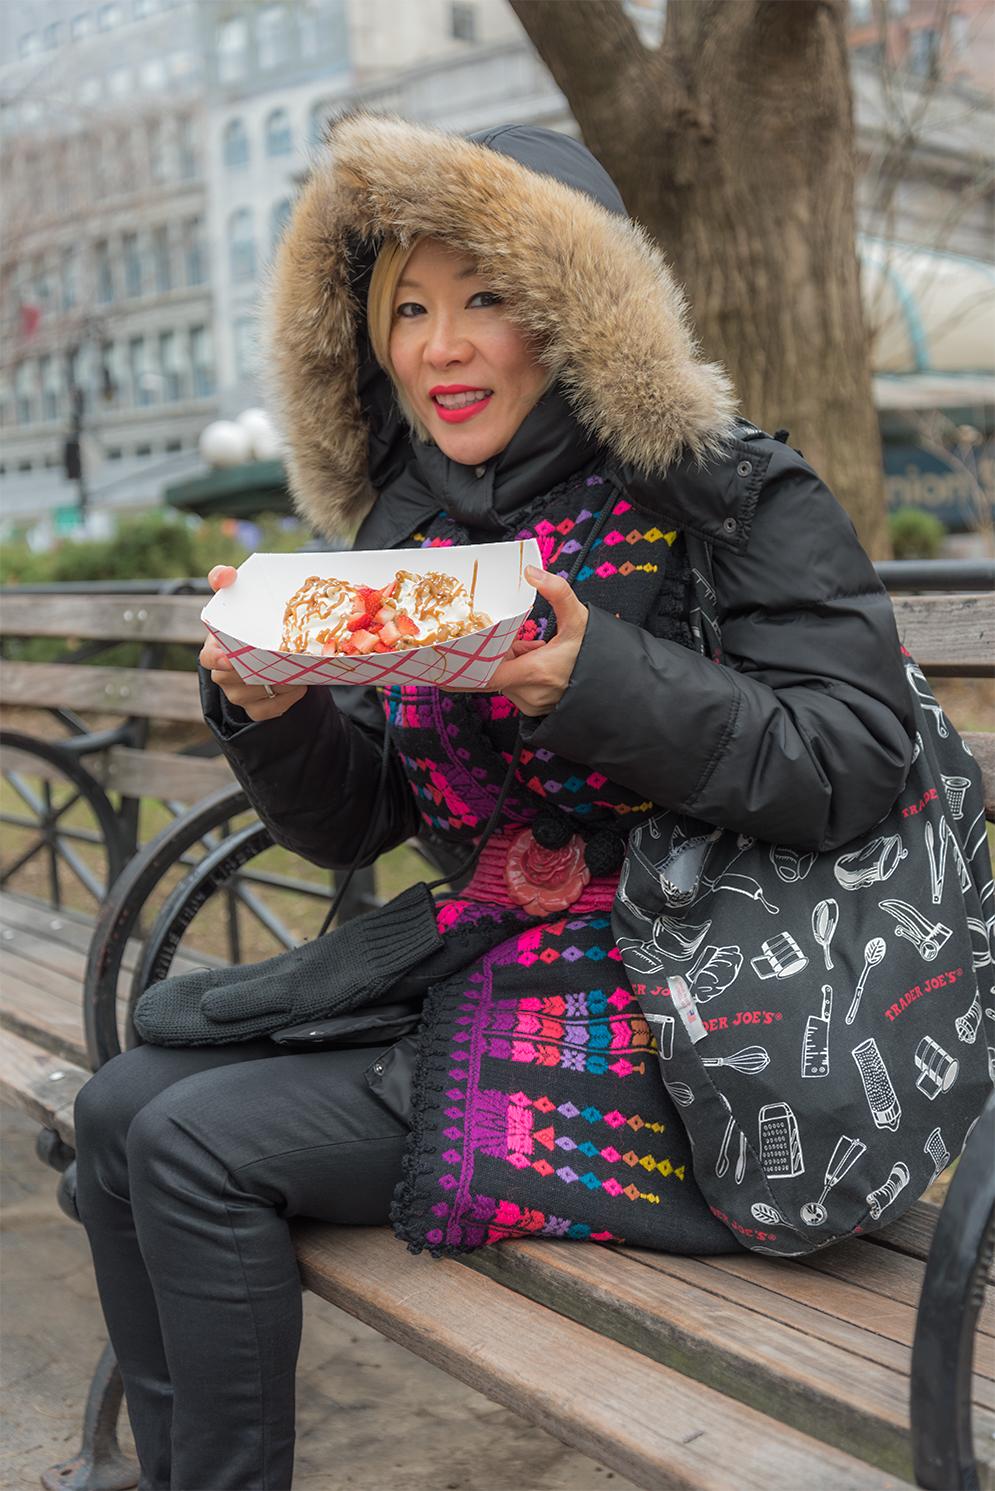 ROCK MAMA NYC LIFESTYLE BLOG - craving waffles